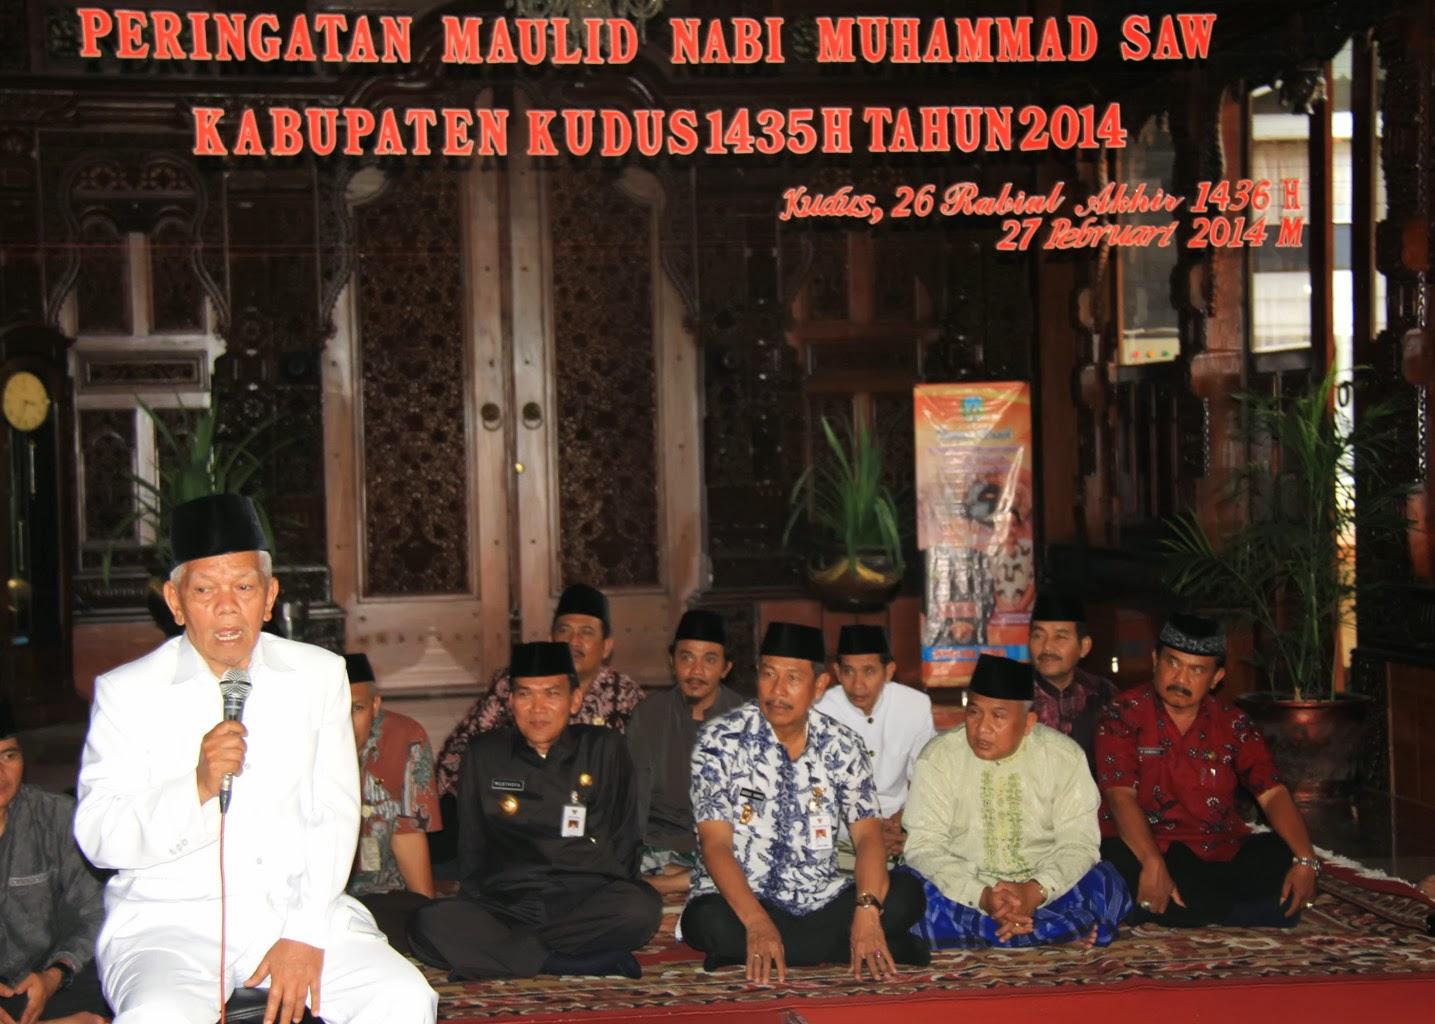 Peringatan Maulid Nabi Muhammad SAW KAbupaten Kudus 1435 H Tahun 2014